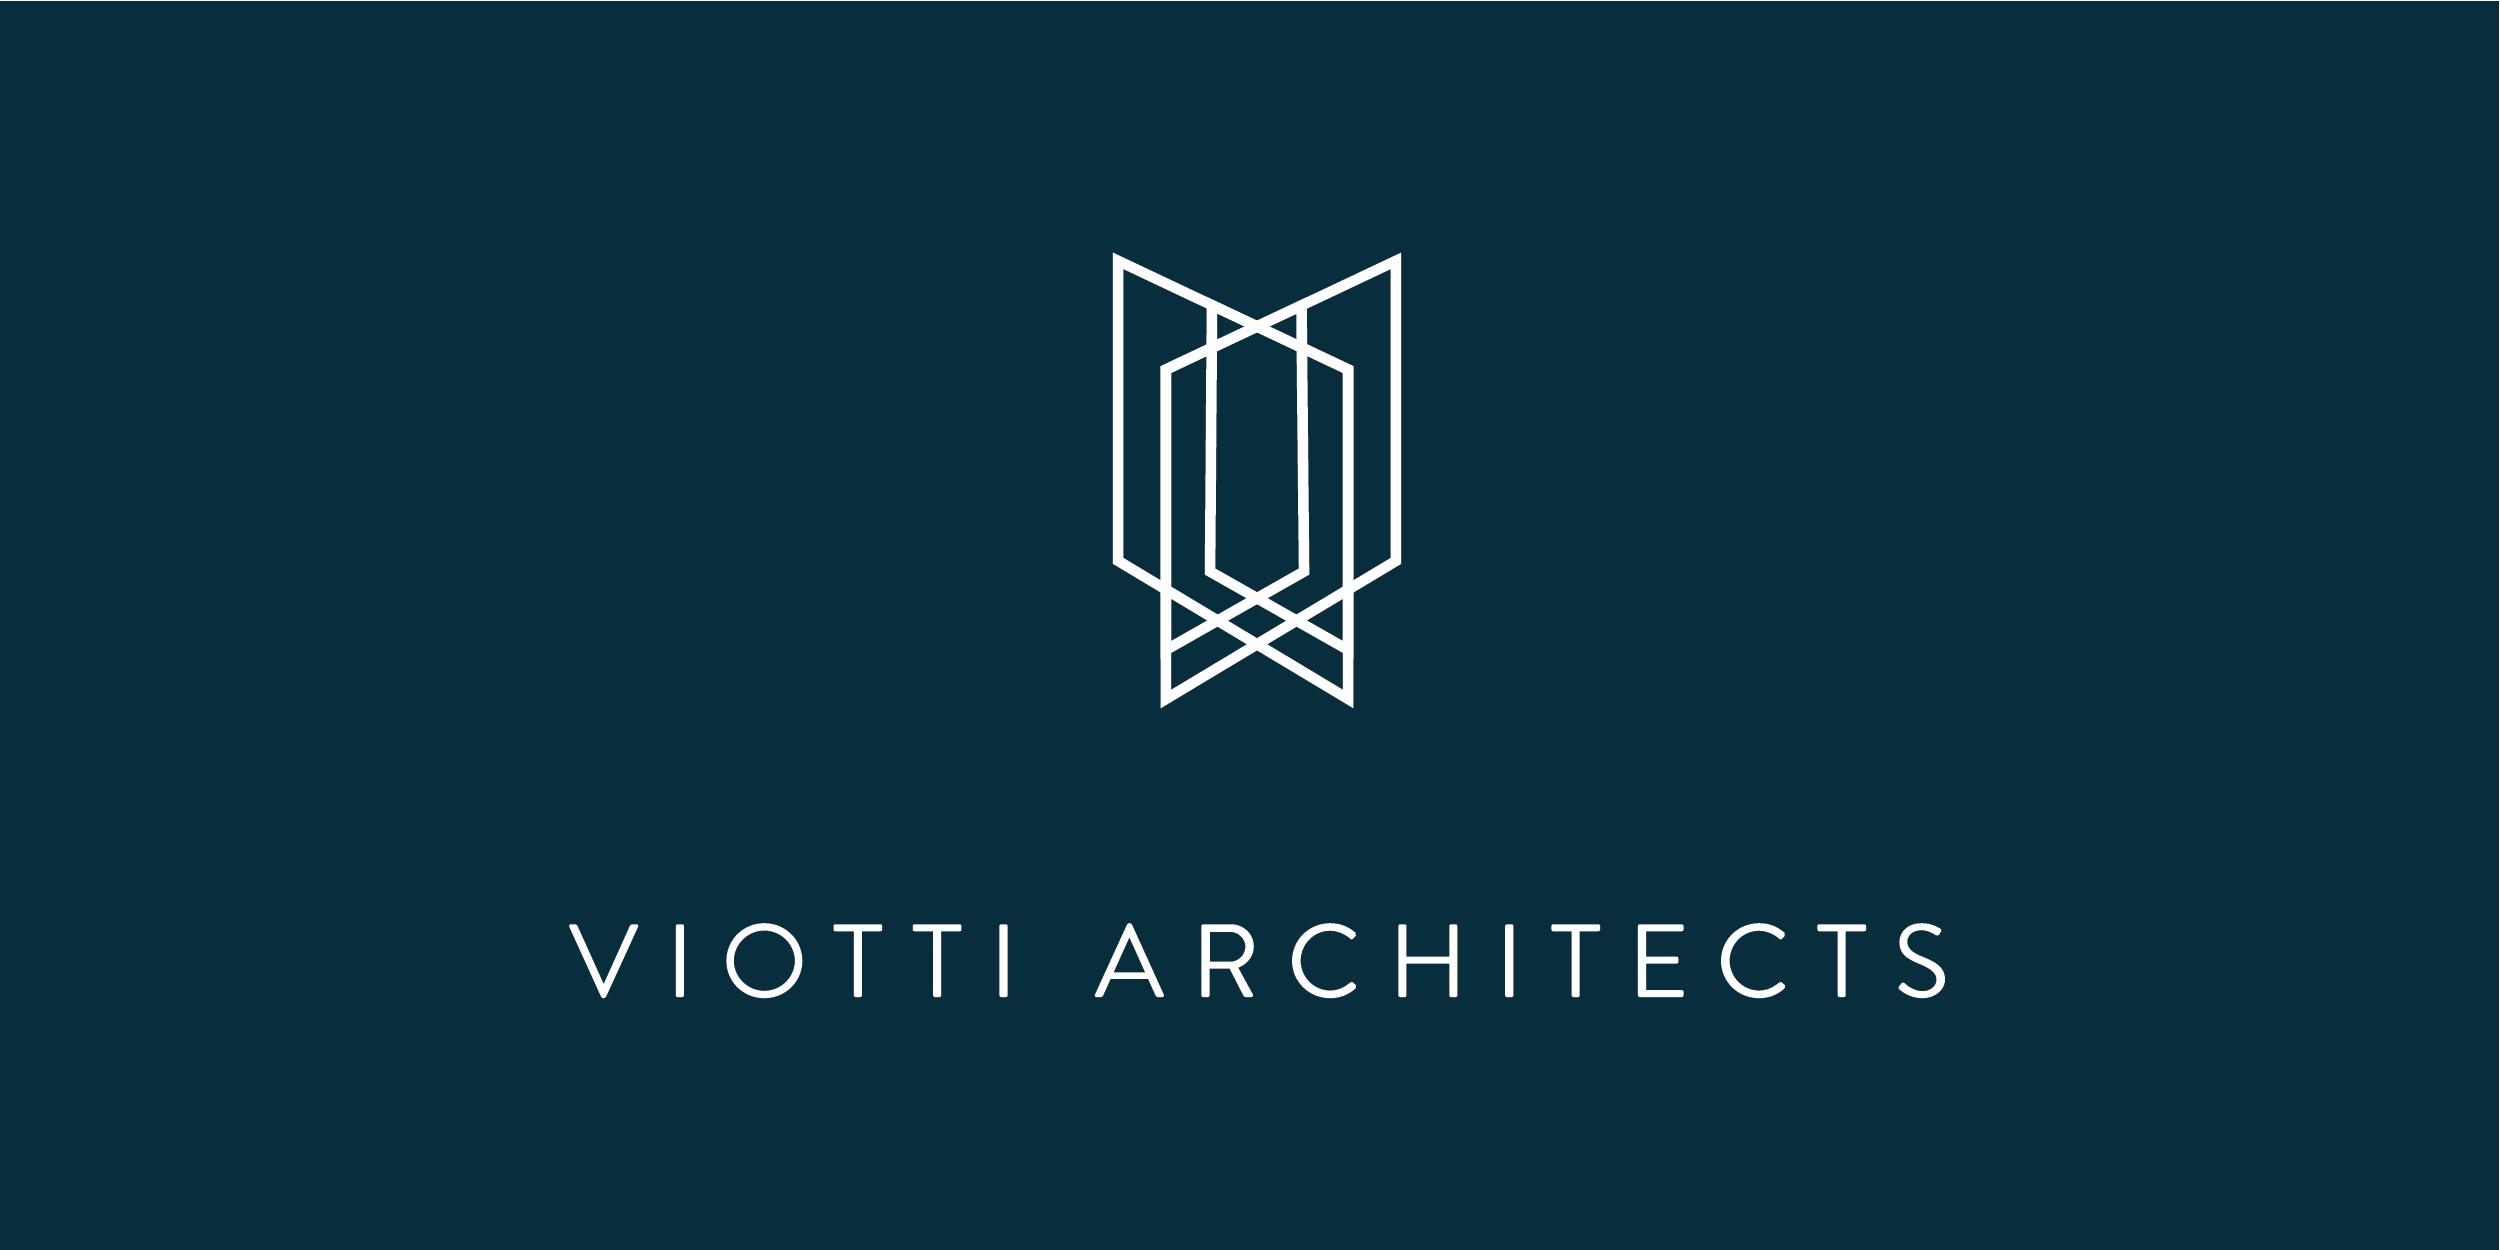 VIOTTI_02.png